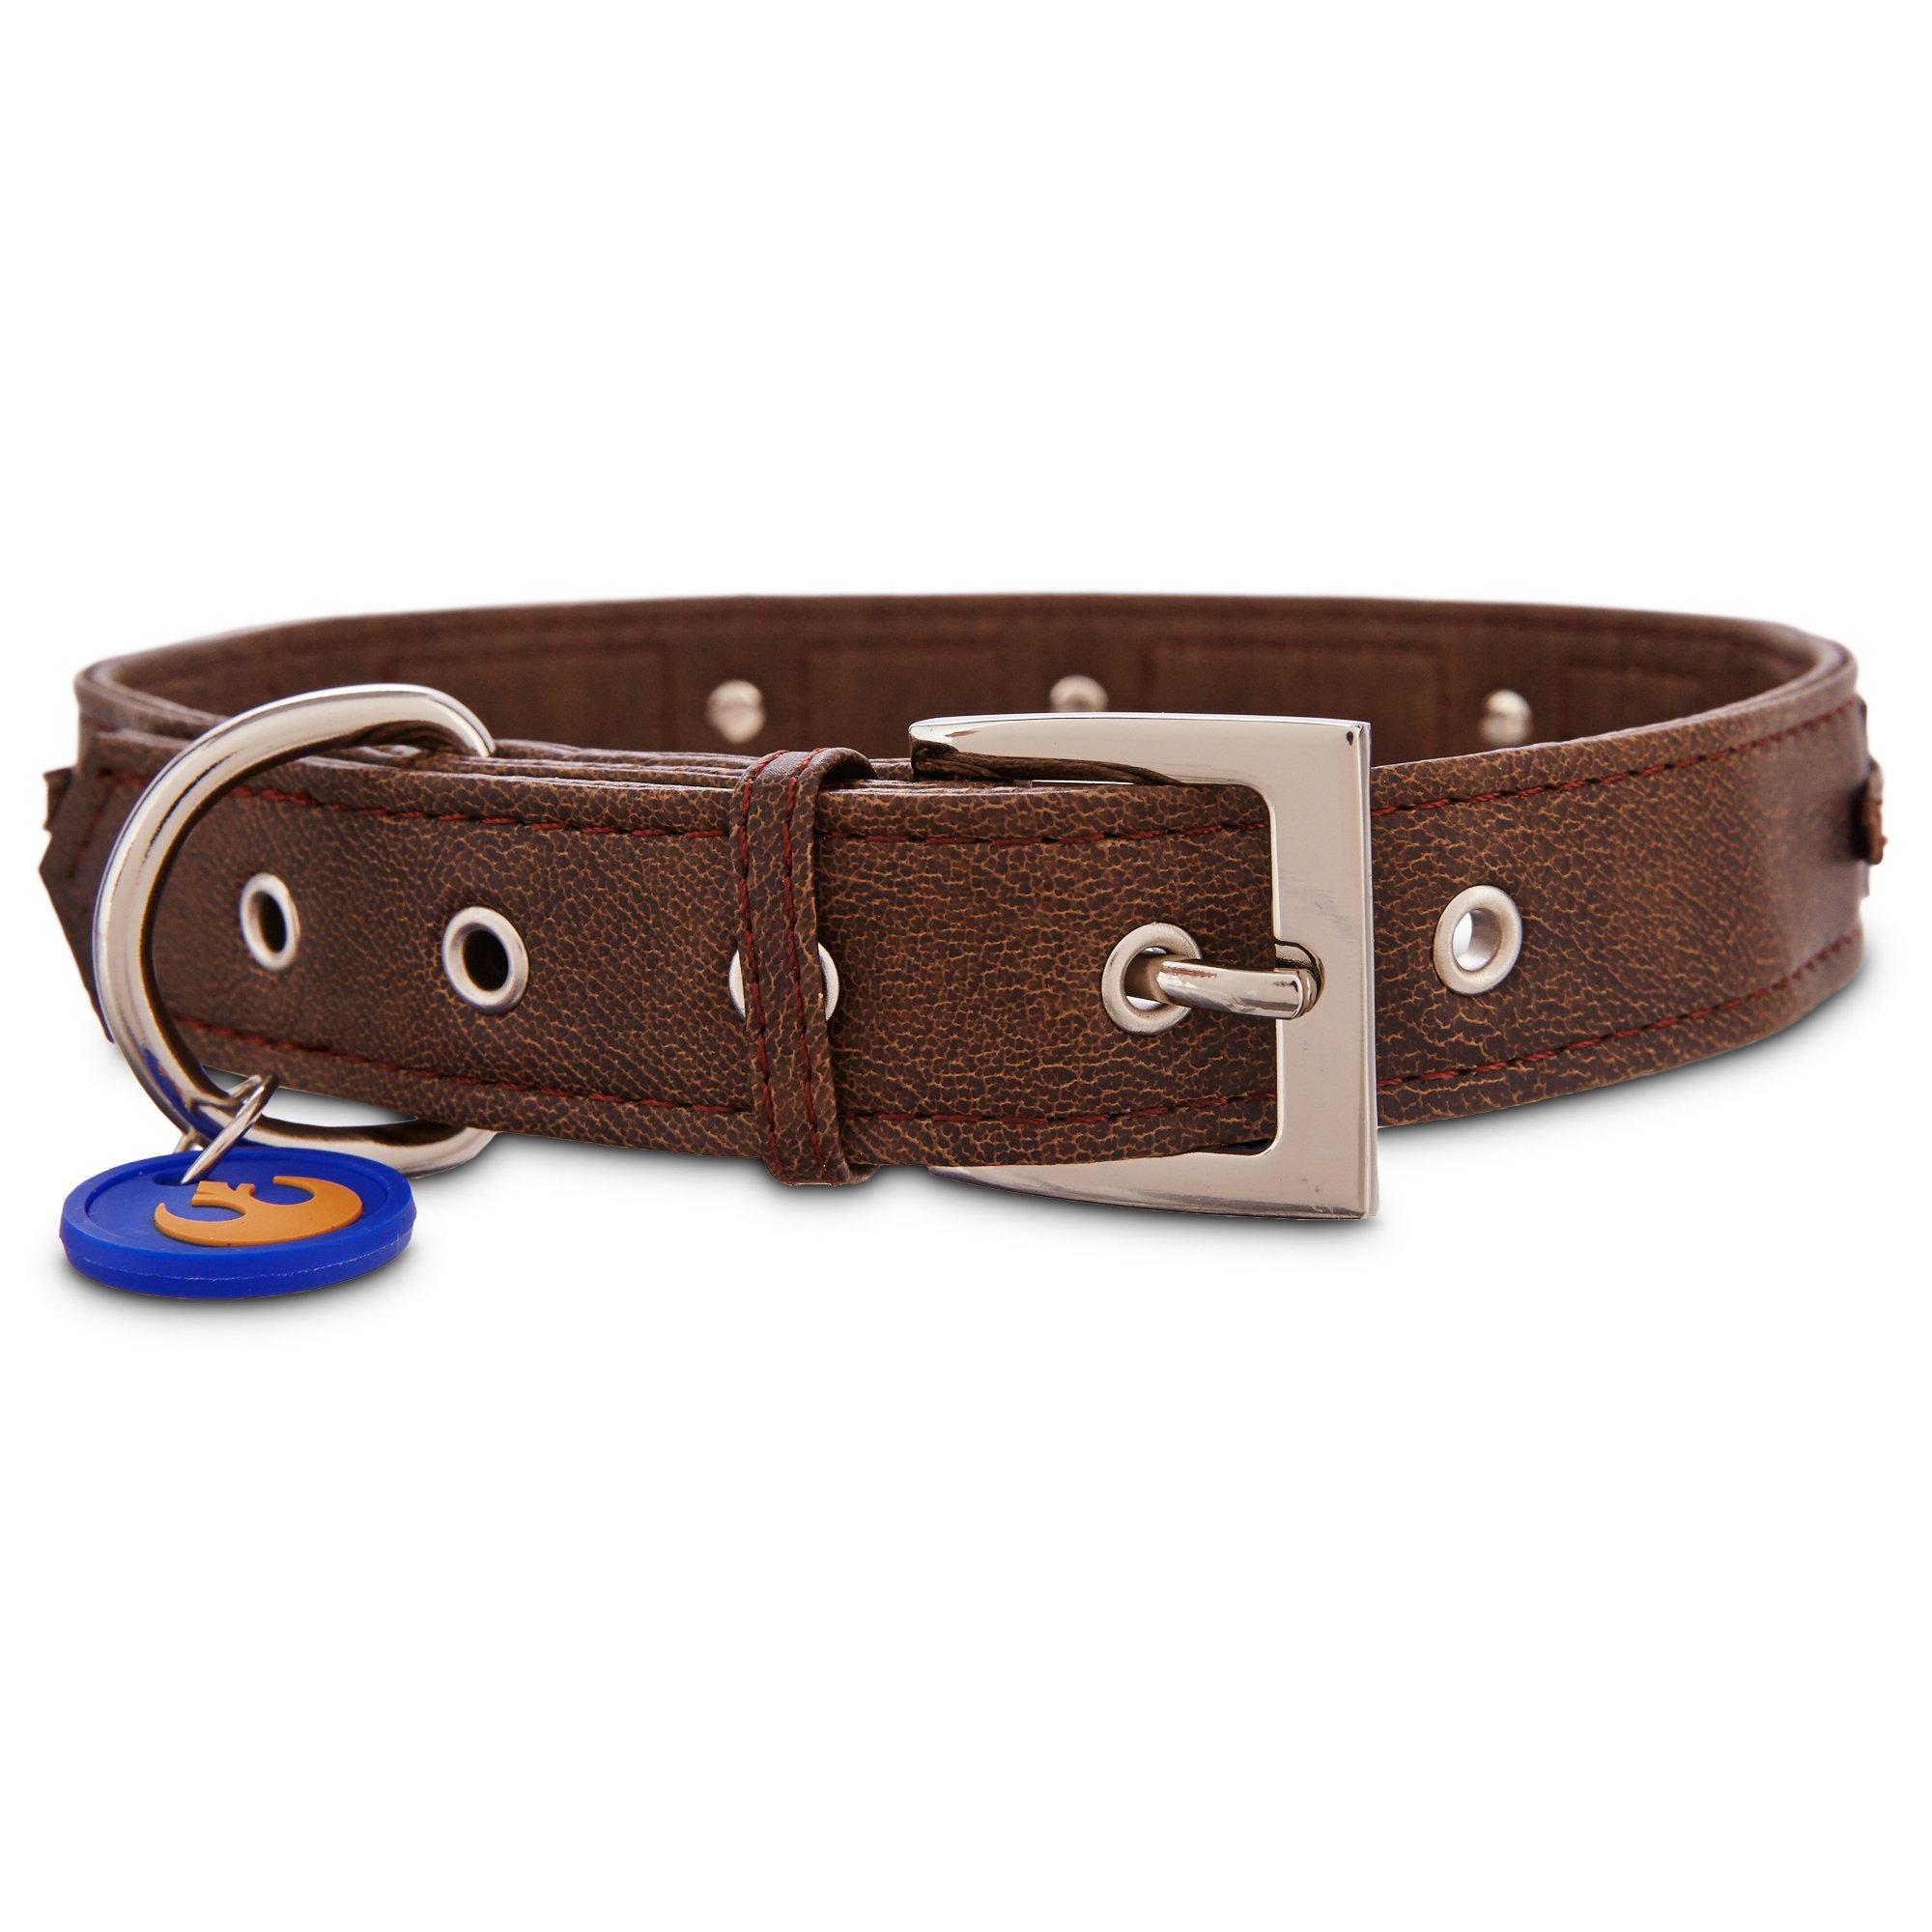 Leather Chewbacca Dog Collar